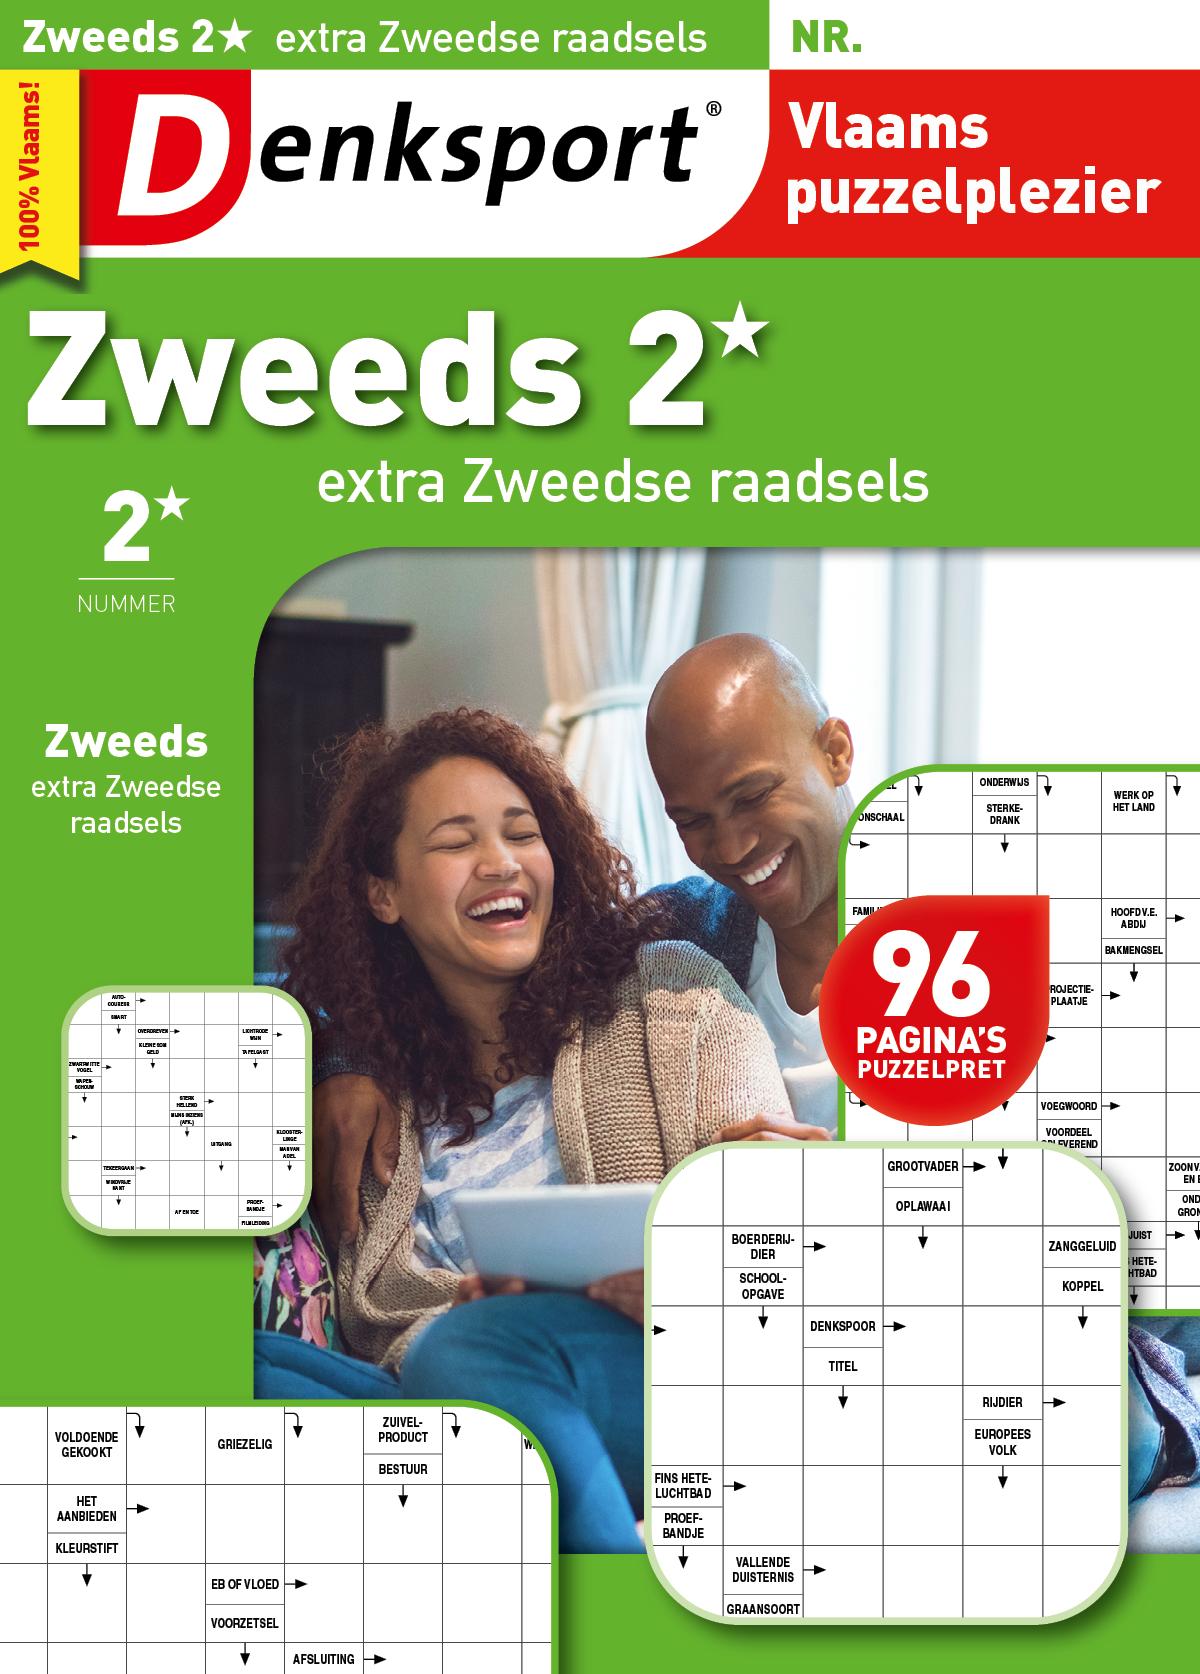 Zweeds 2* extra zweedse raadsels Abonnement